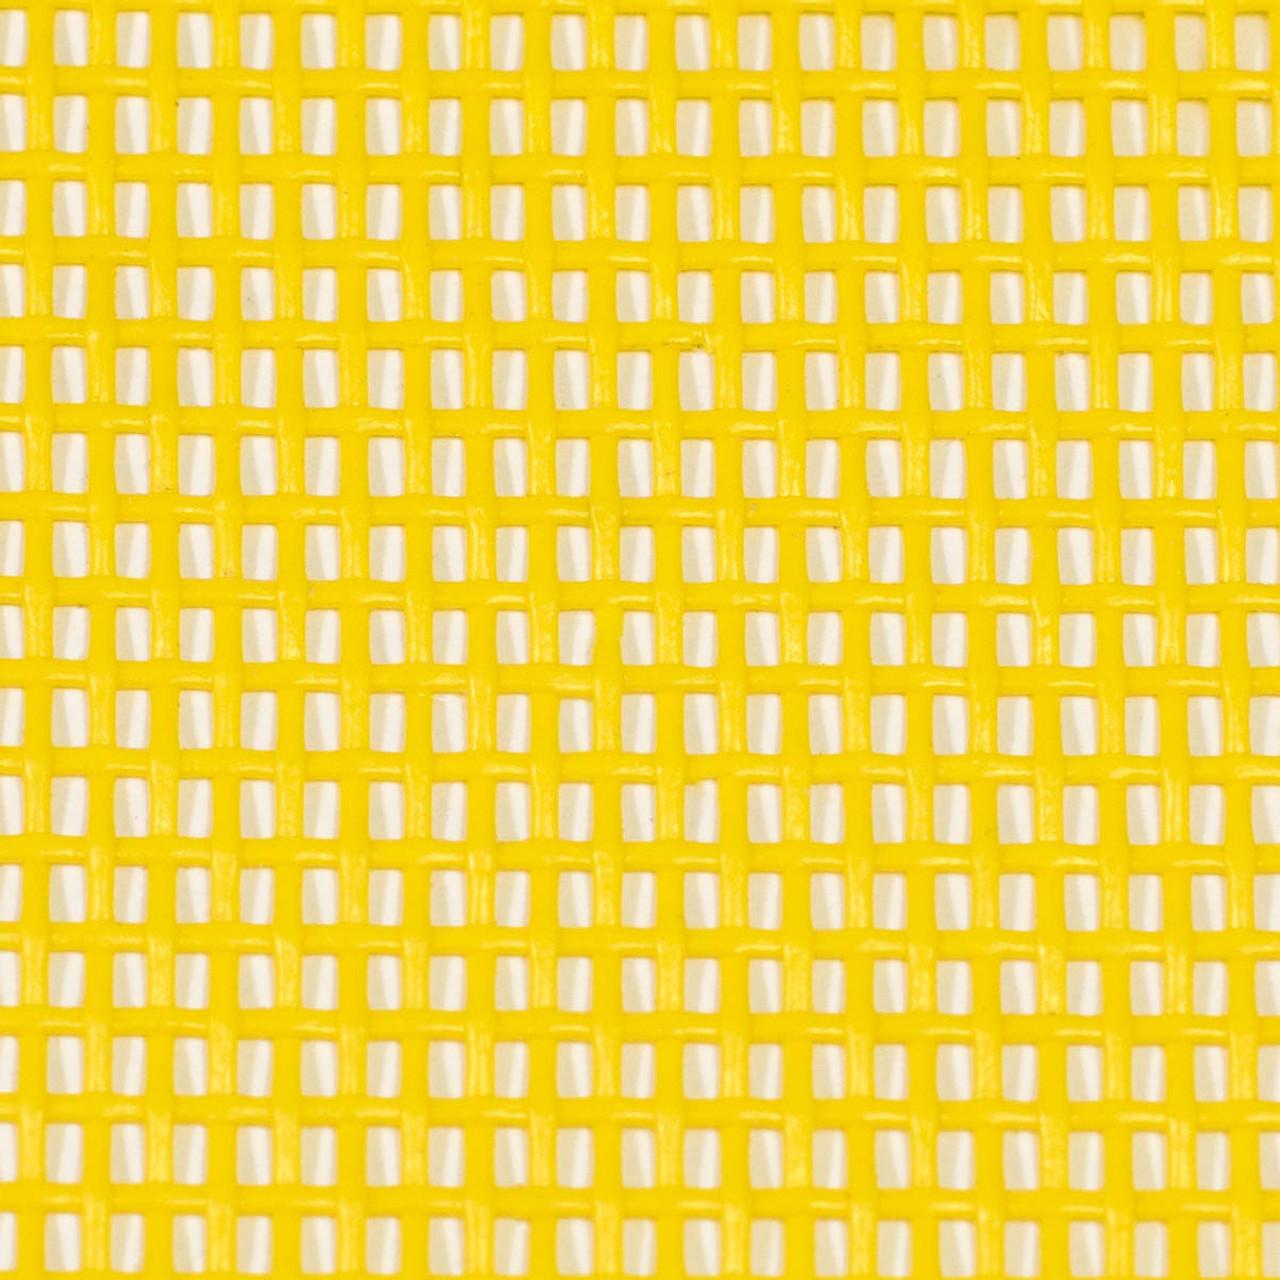 Yellow Pet Screen Cut Pieces